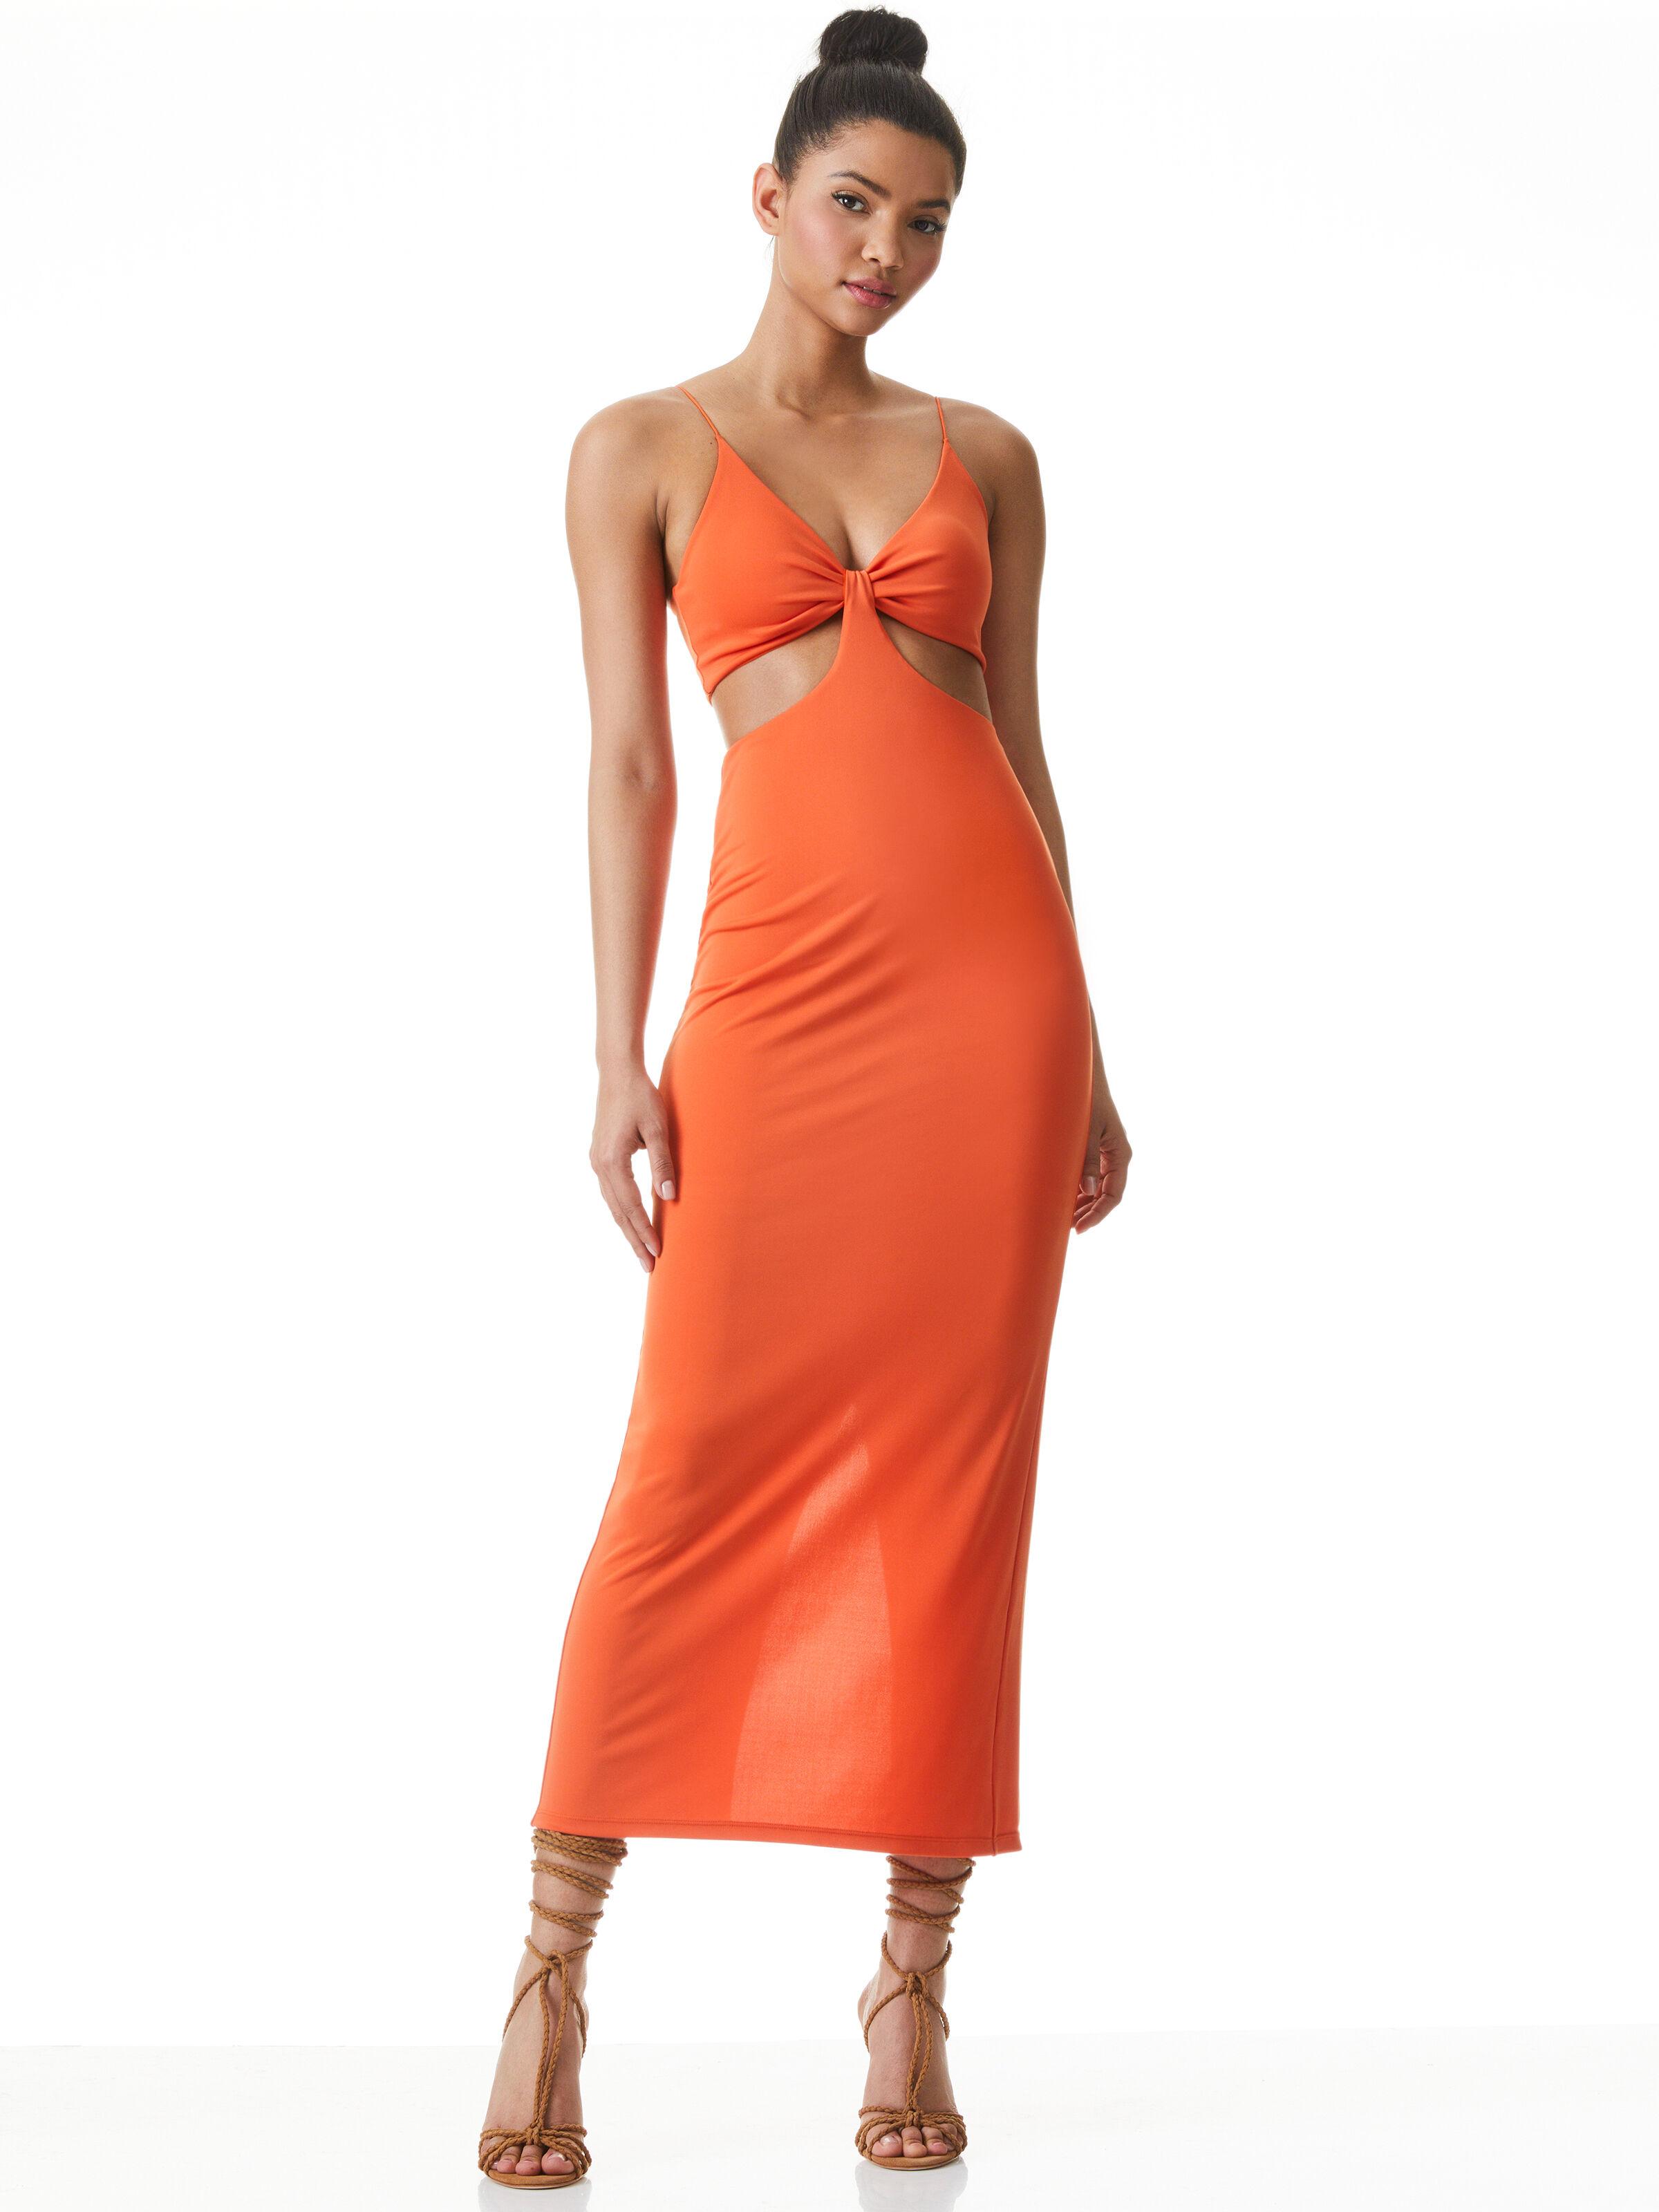 Cut Out Cocktail Dress,Orange Maxi Dress,cut out maxi dress,orange maxi dress,